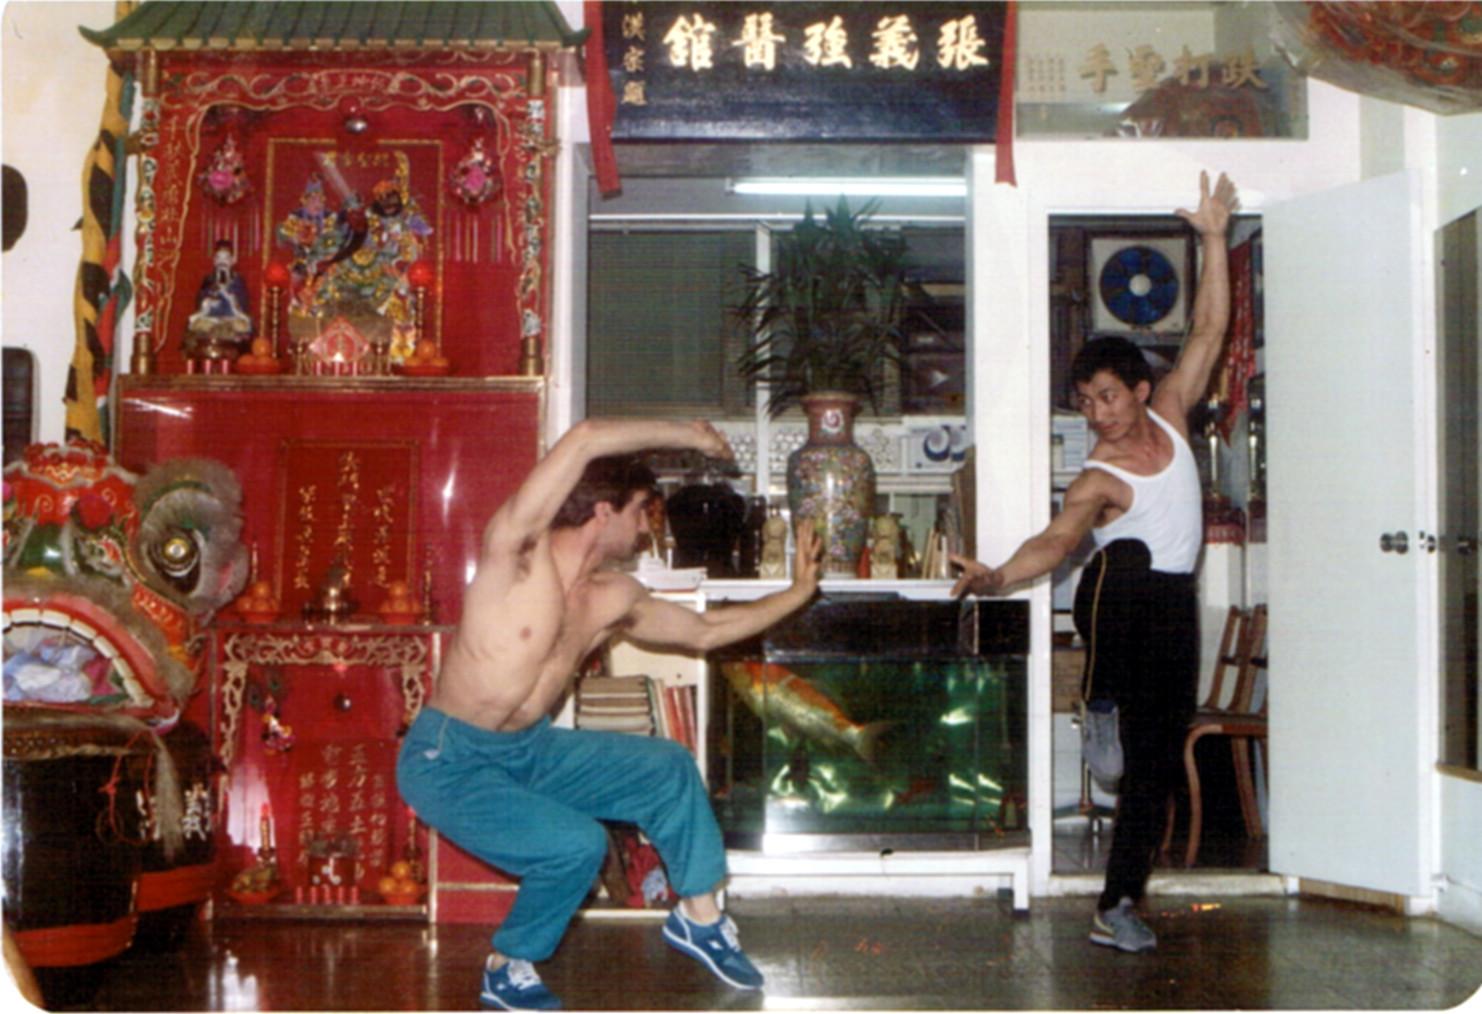 1988 SIFU TZE CHEON YIN E SIFU 3